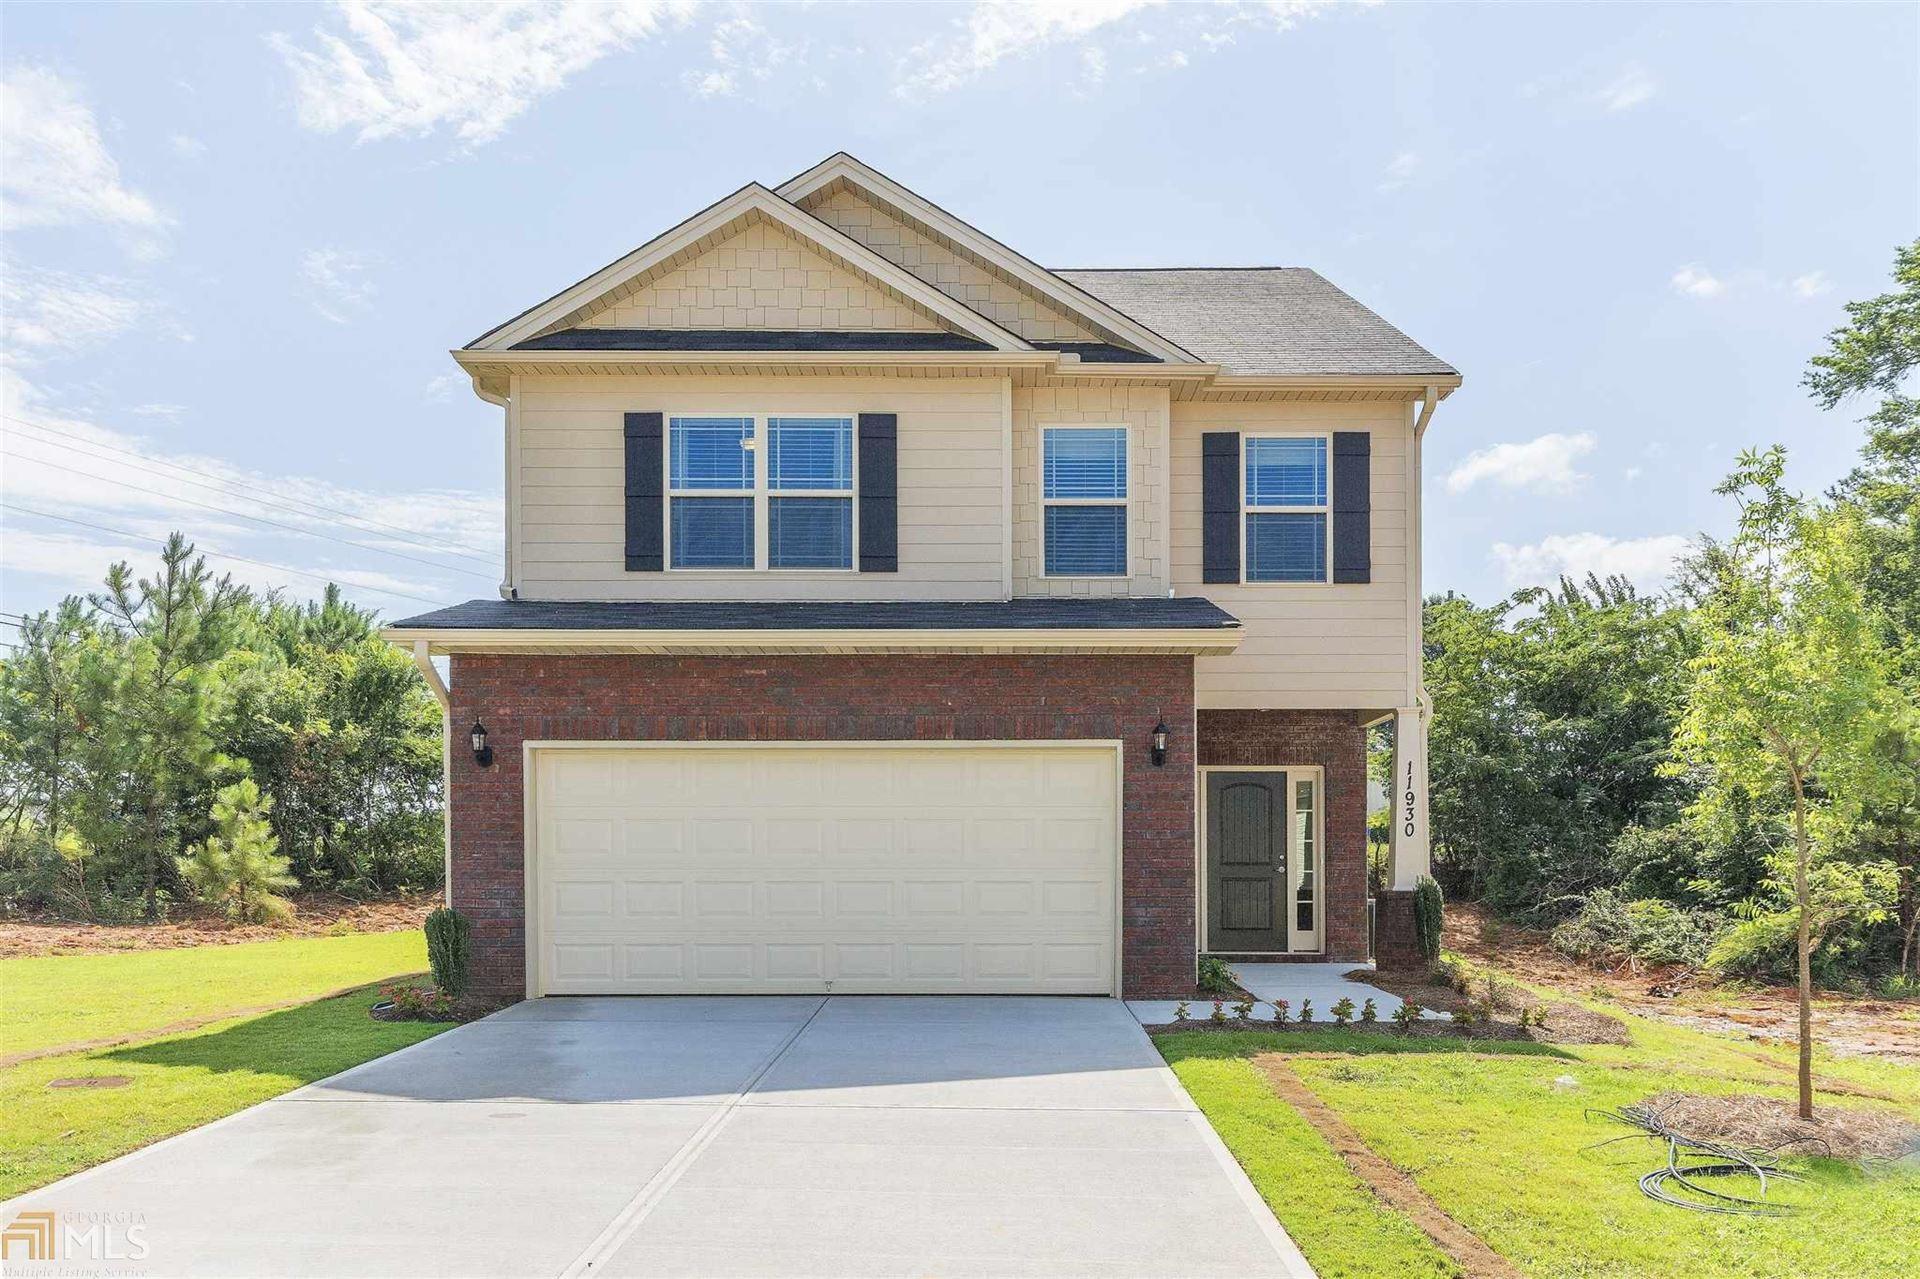 11943 Quail Rd, Hampton, GA 30228 - MLS#: 8713308